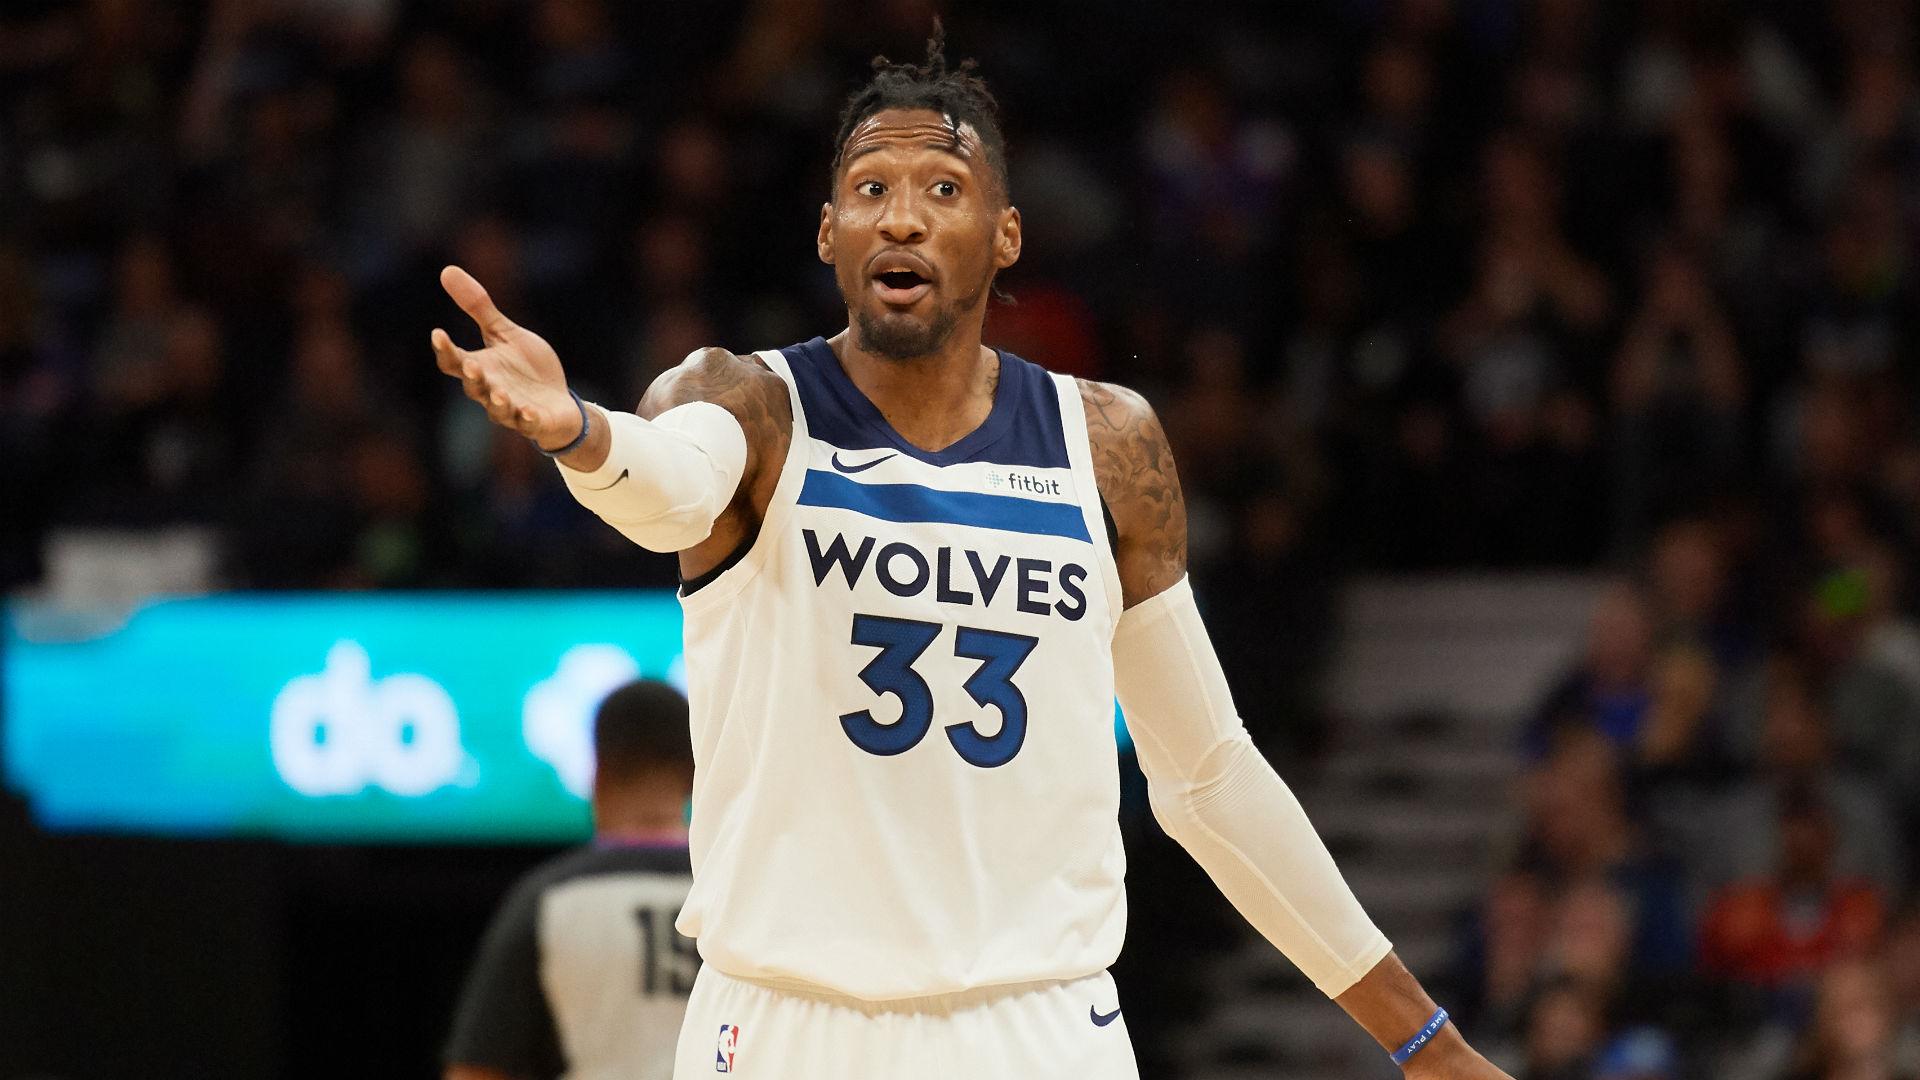 NBA trade rumors: Rockets have 'serious interest' in Timberwolves' Robert Covington